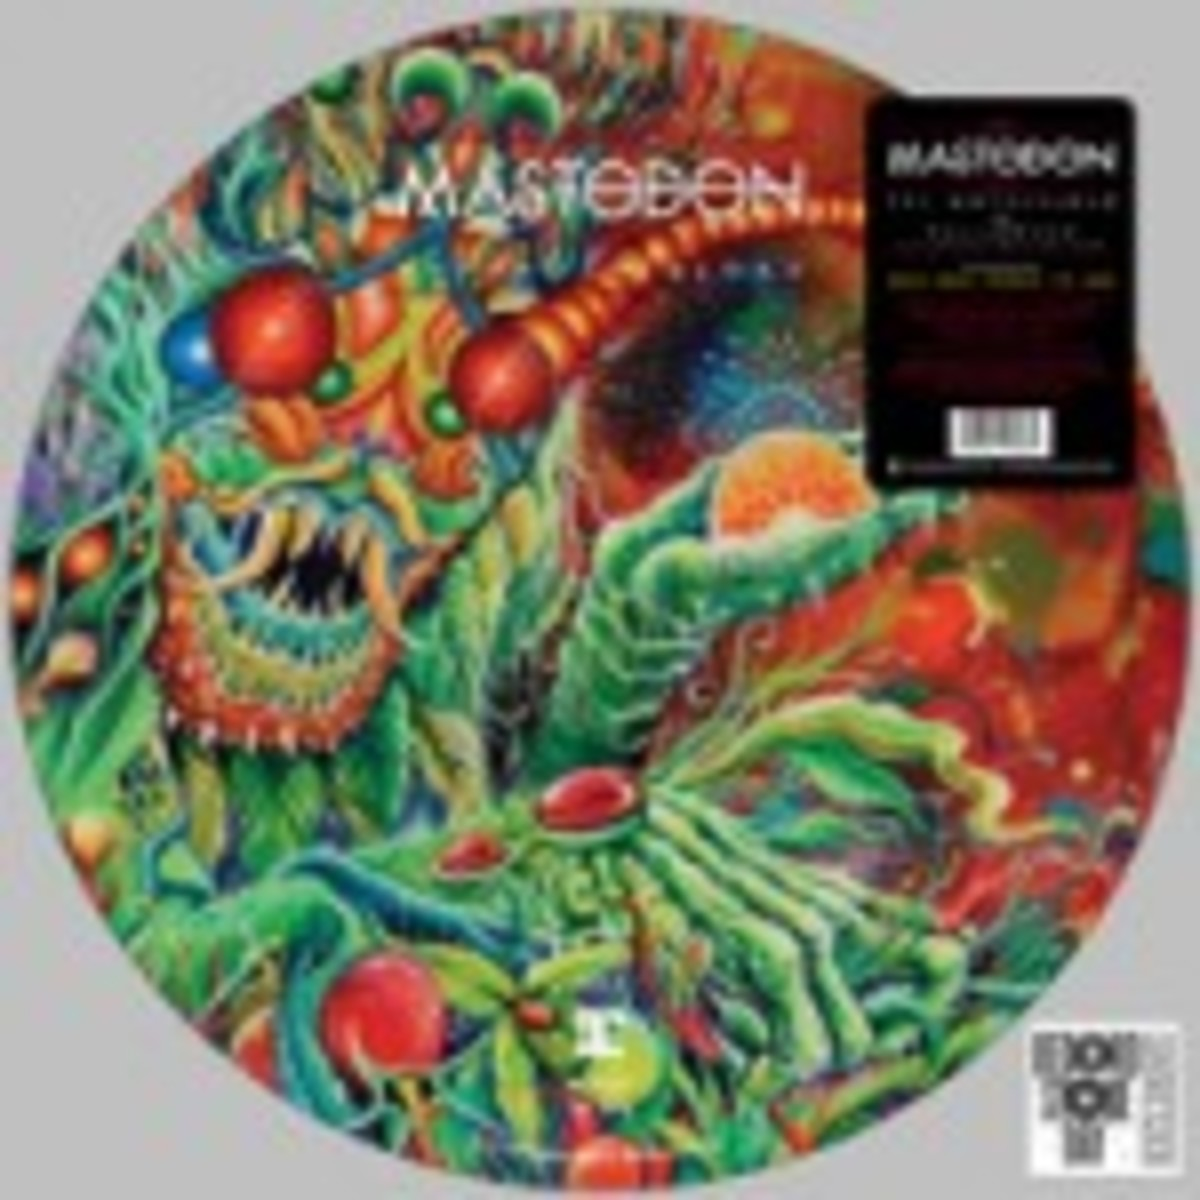 Mastodon The Motherload vinyl picture disc